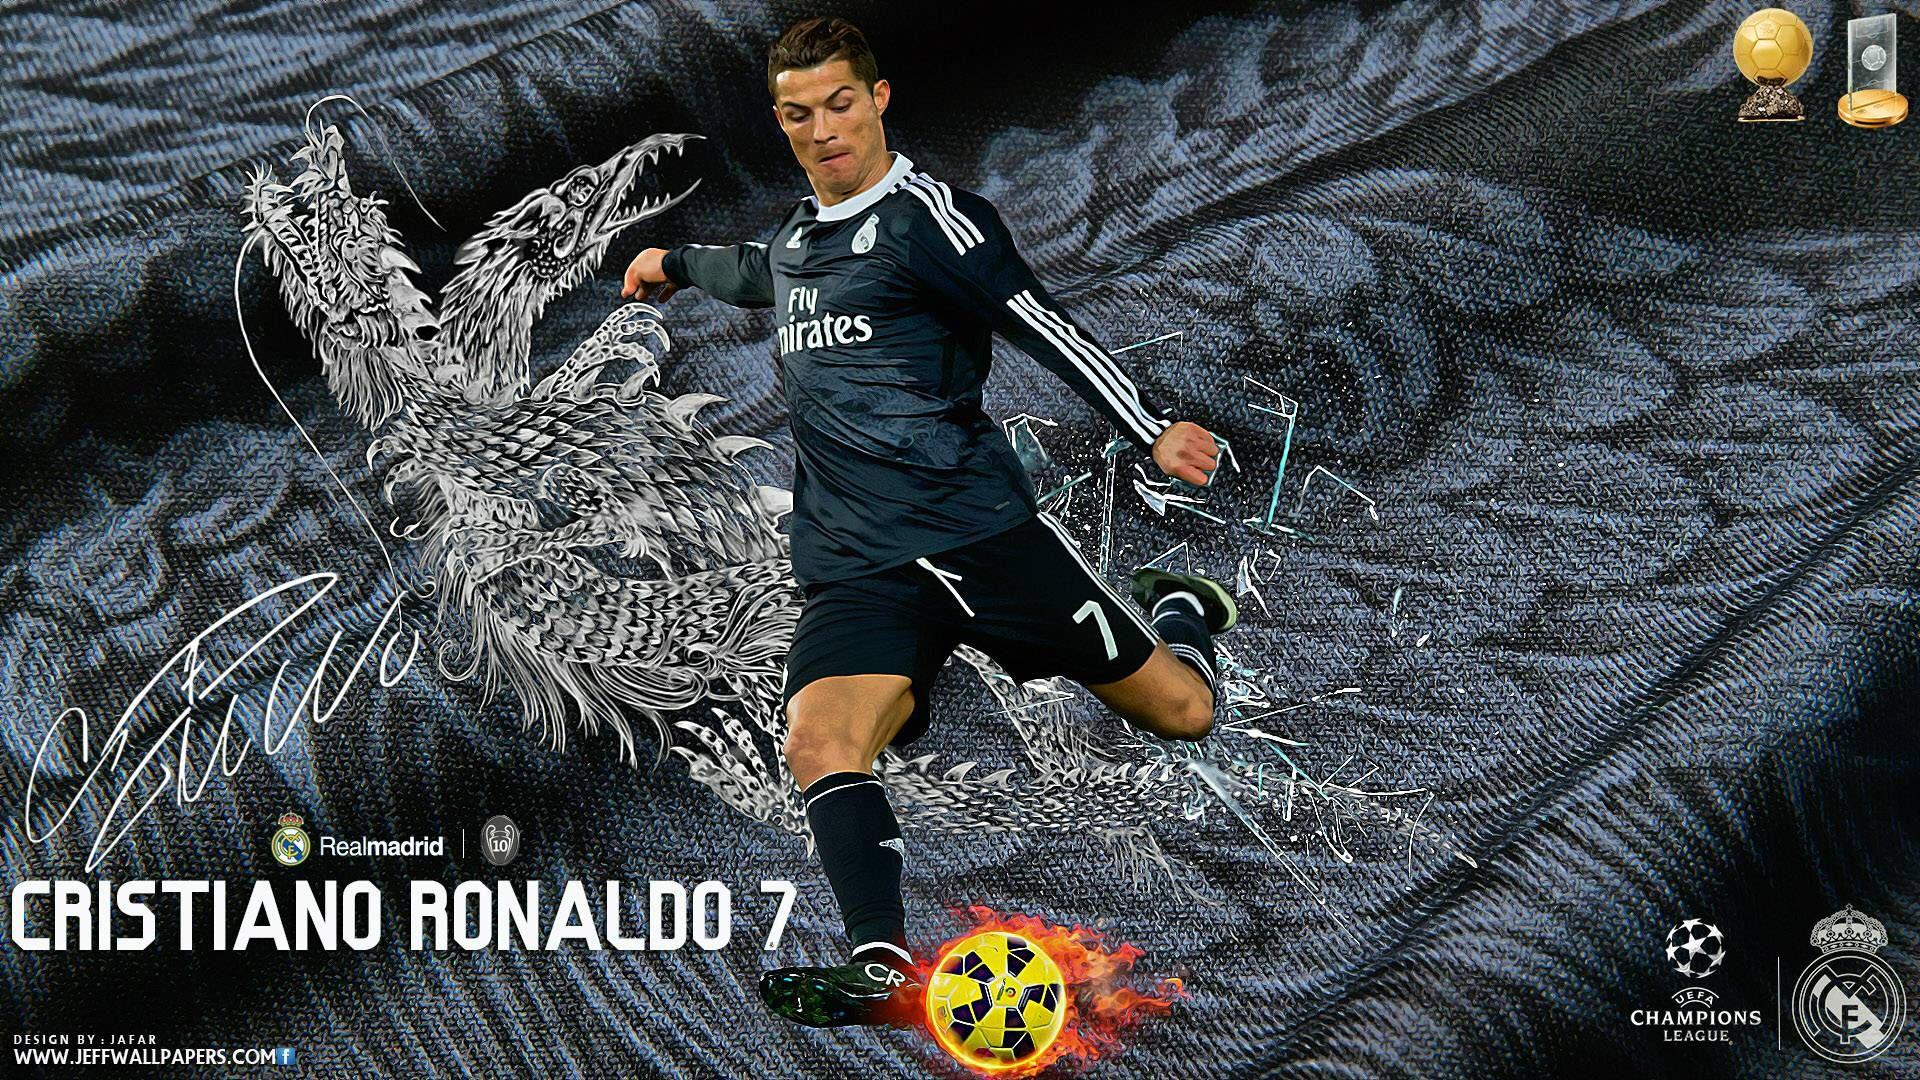 Hd wallpaper ronaldo - Cristiano Ronaldo Wallpapers